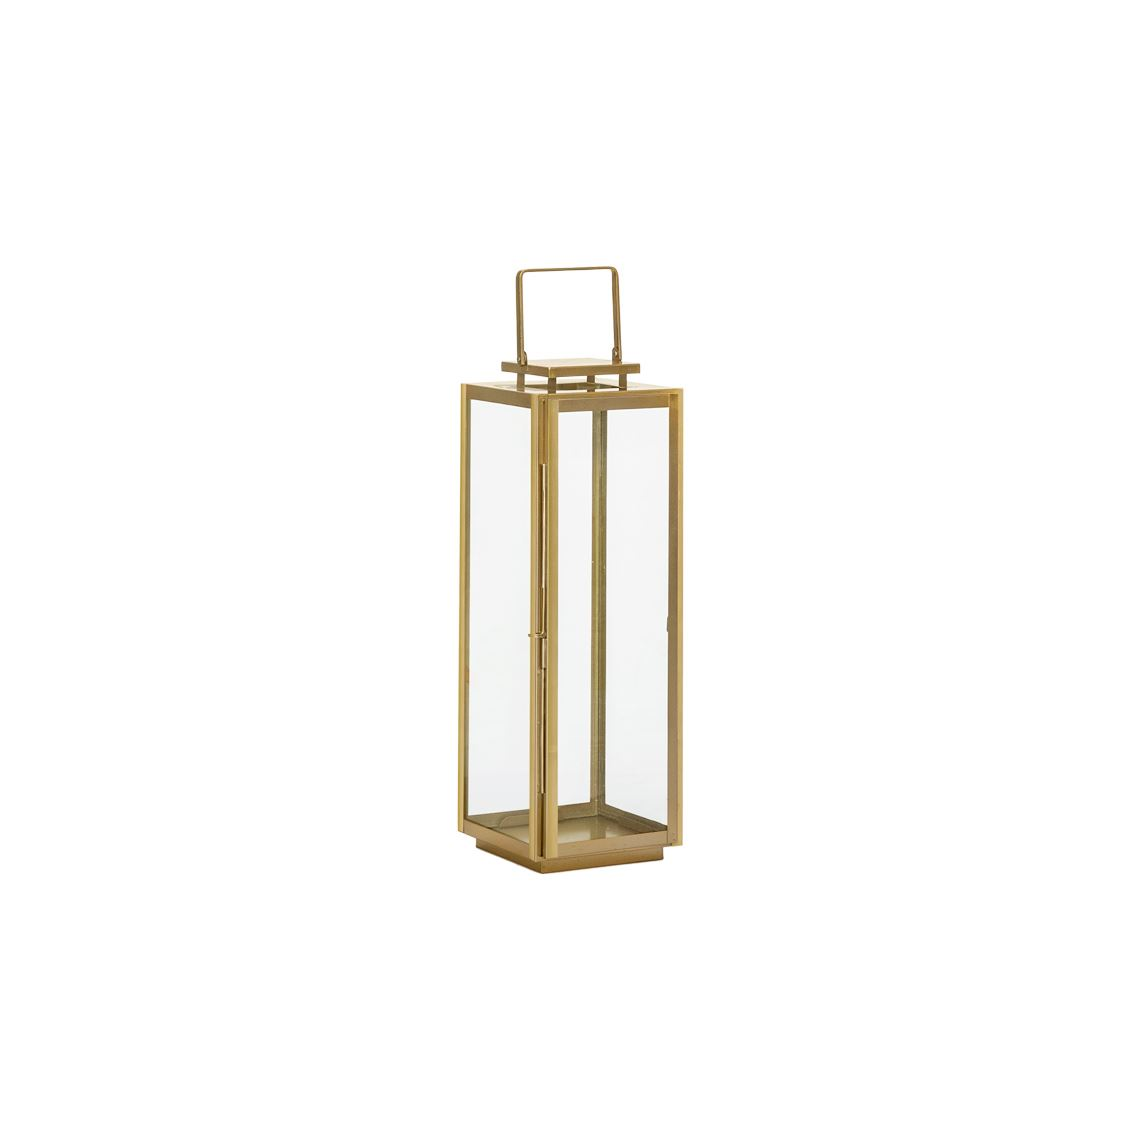 Balzan Lantern, Colour Size W 13cm x D 13cm x H 29cm in Gold Freedom